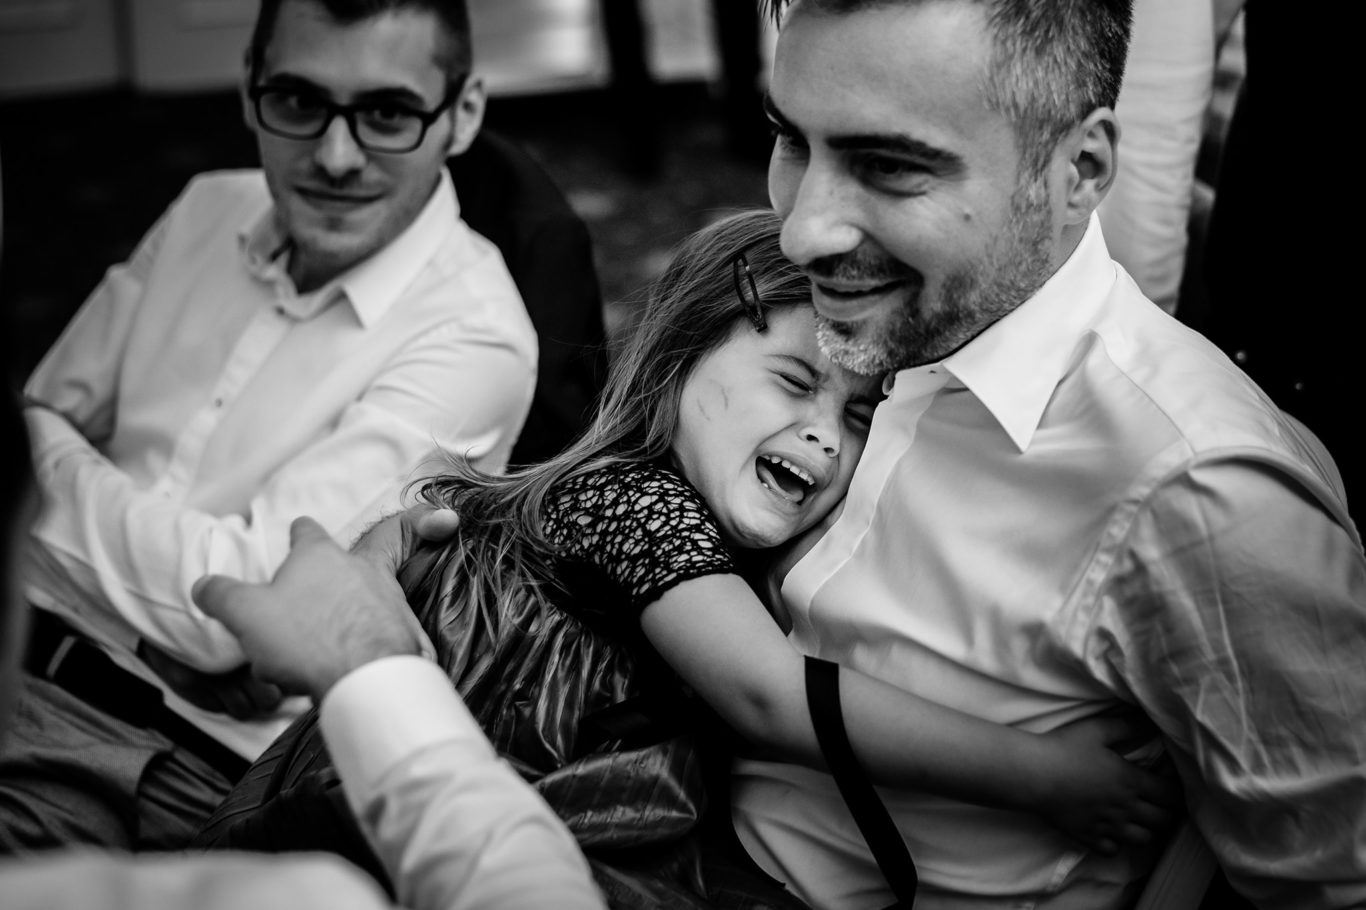 0626-fotografie-nunta-bucuresti-anca-george-fotograf-ciprian-dumitrescu-dsc_9401